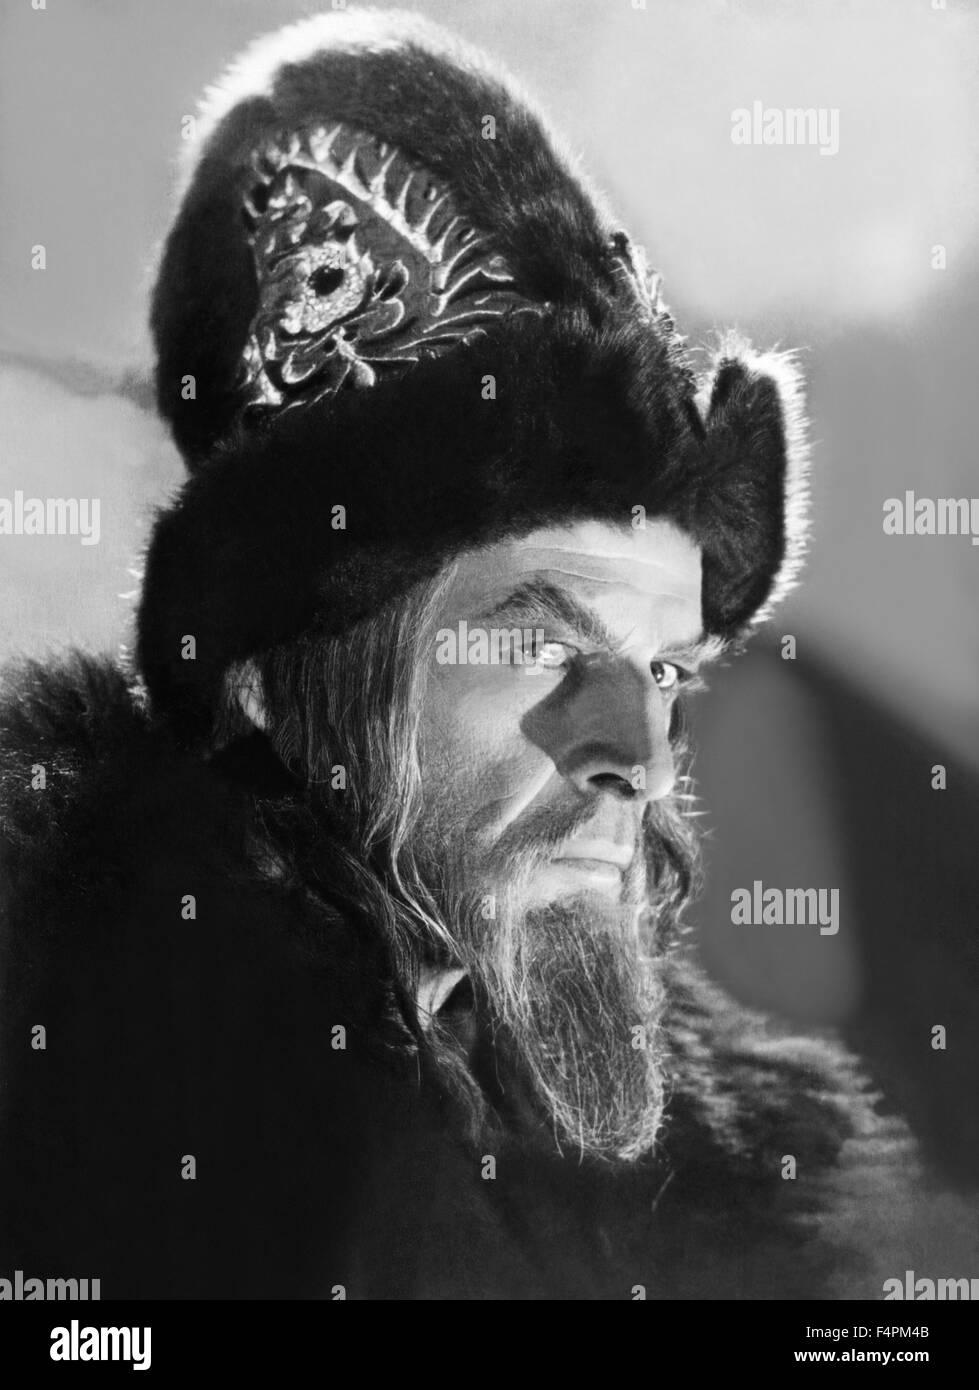 Nikolai Cherkasov / Alexandre NevskiI / 1966 directed by Andrey Tarkovskiy [Mosfilm] - Stock Image